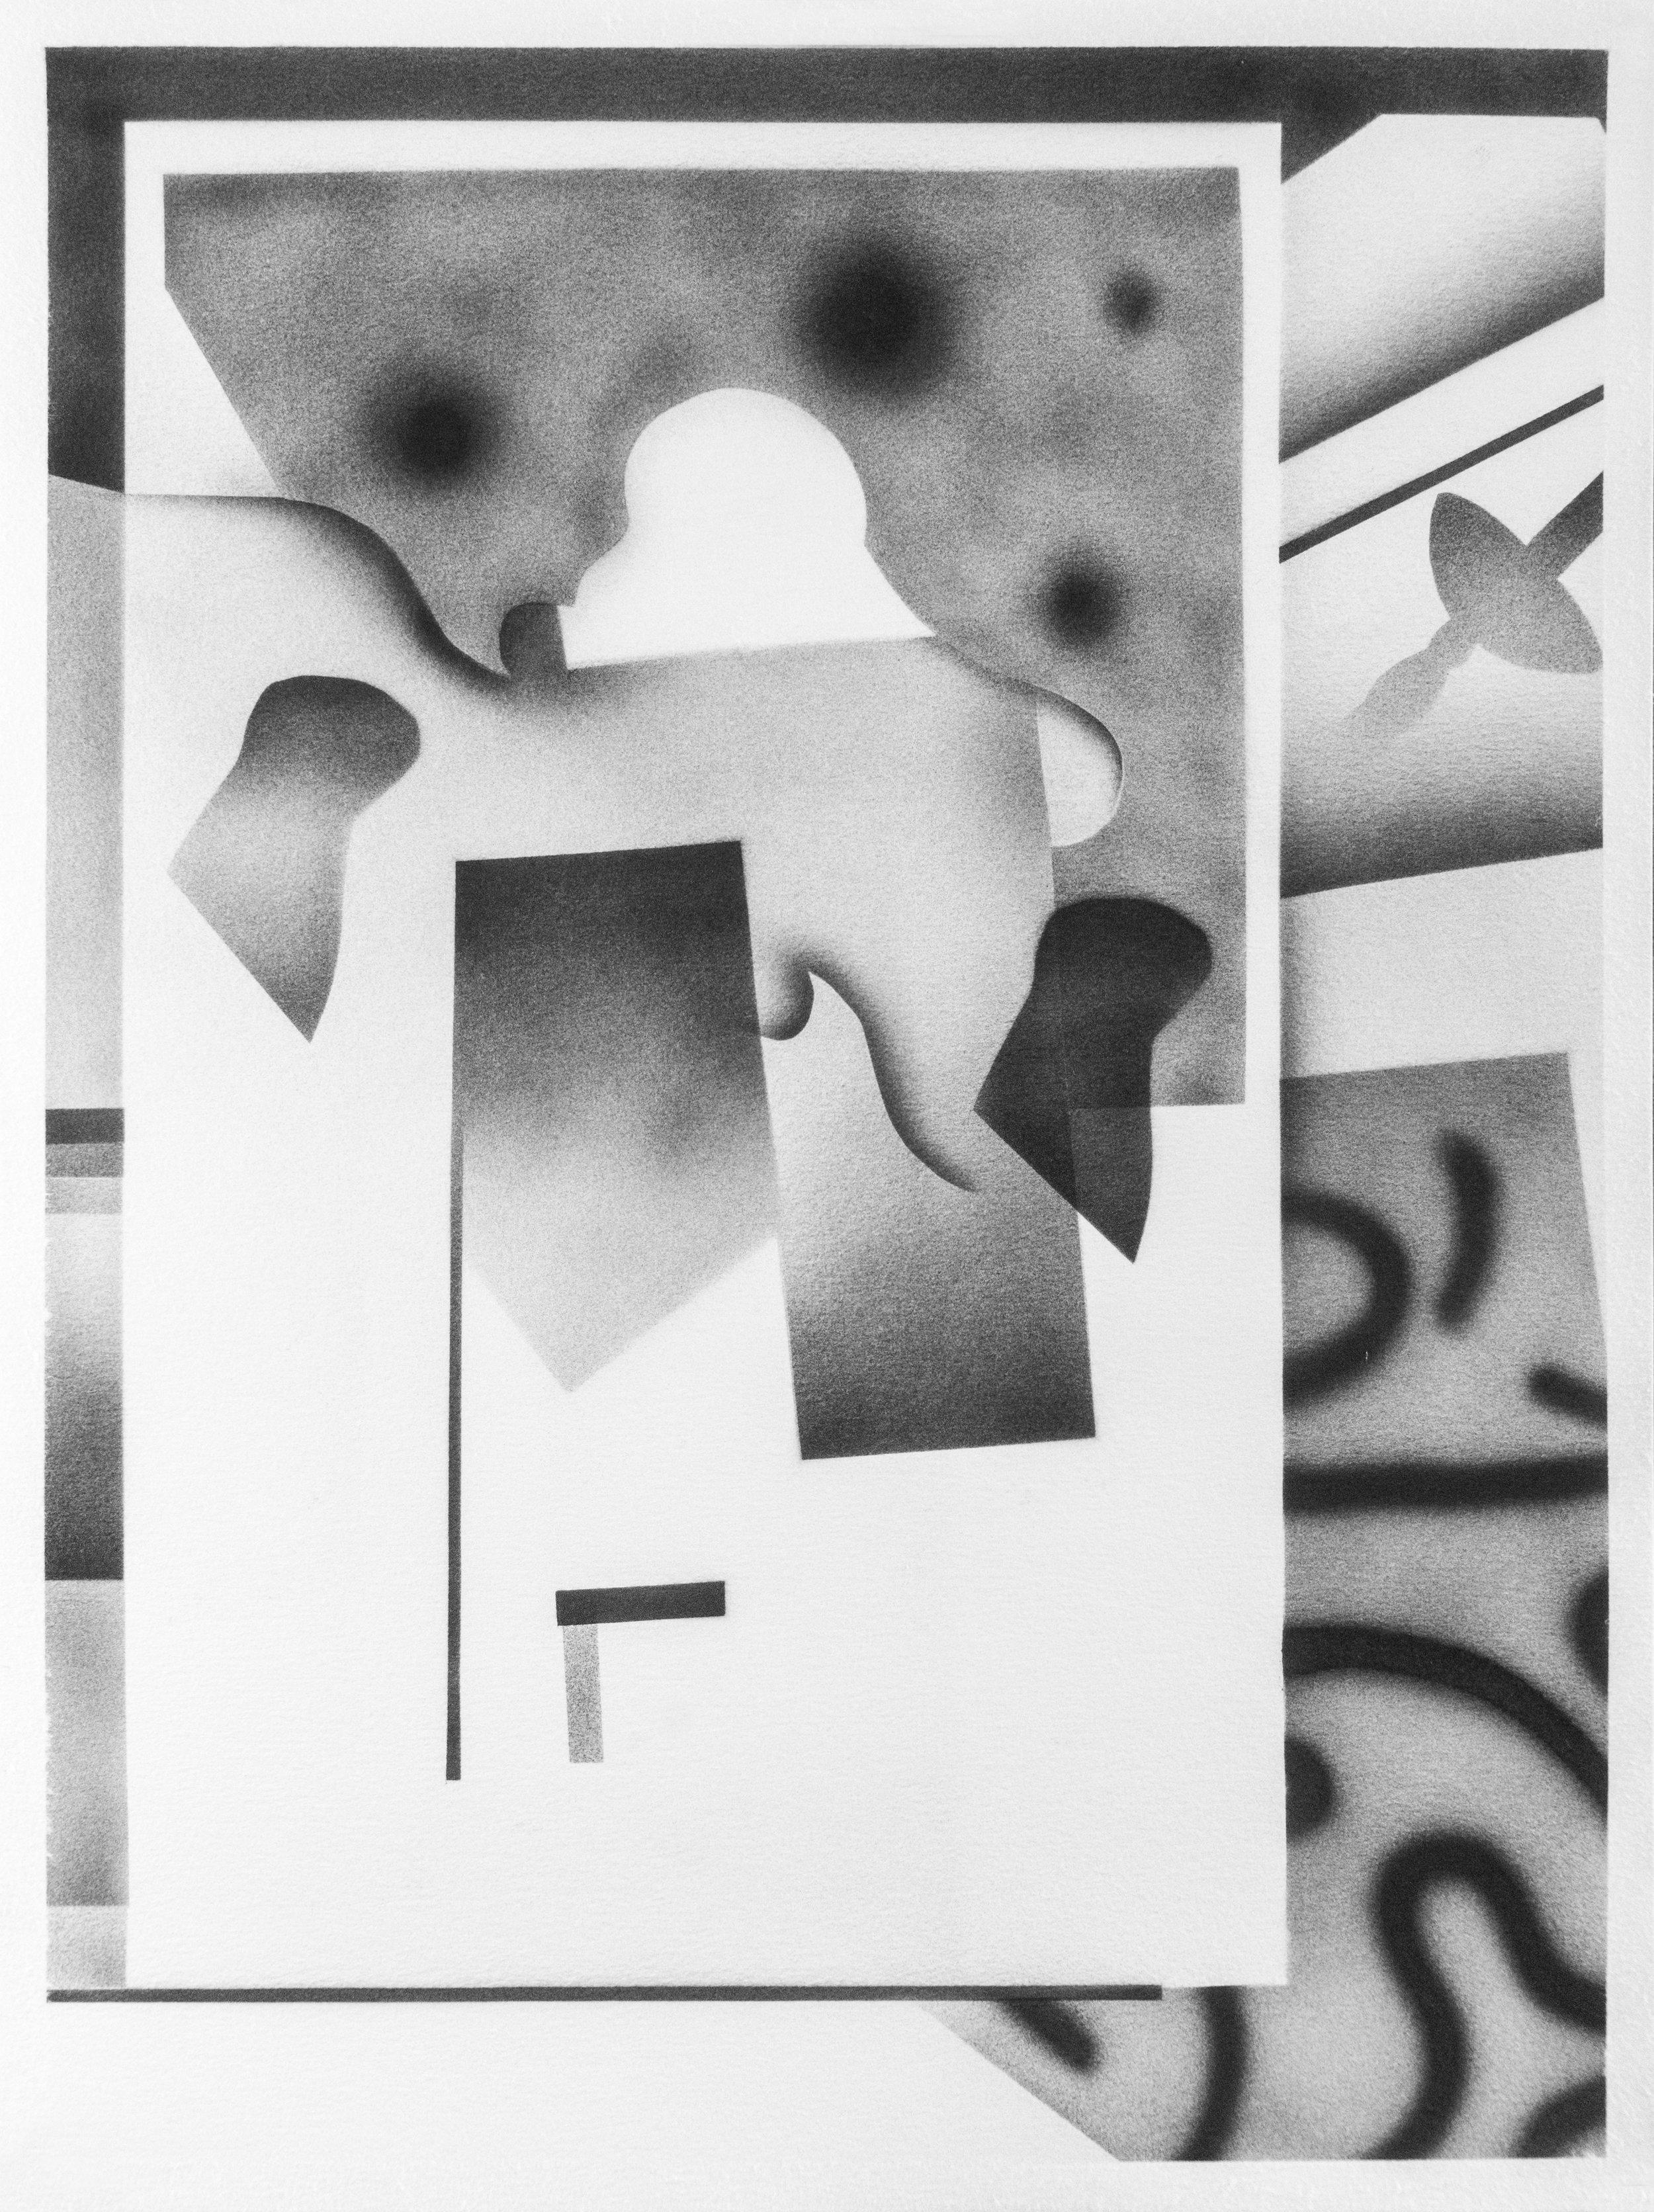 2018, Acrylic on Paper, 32x24cm